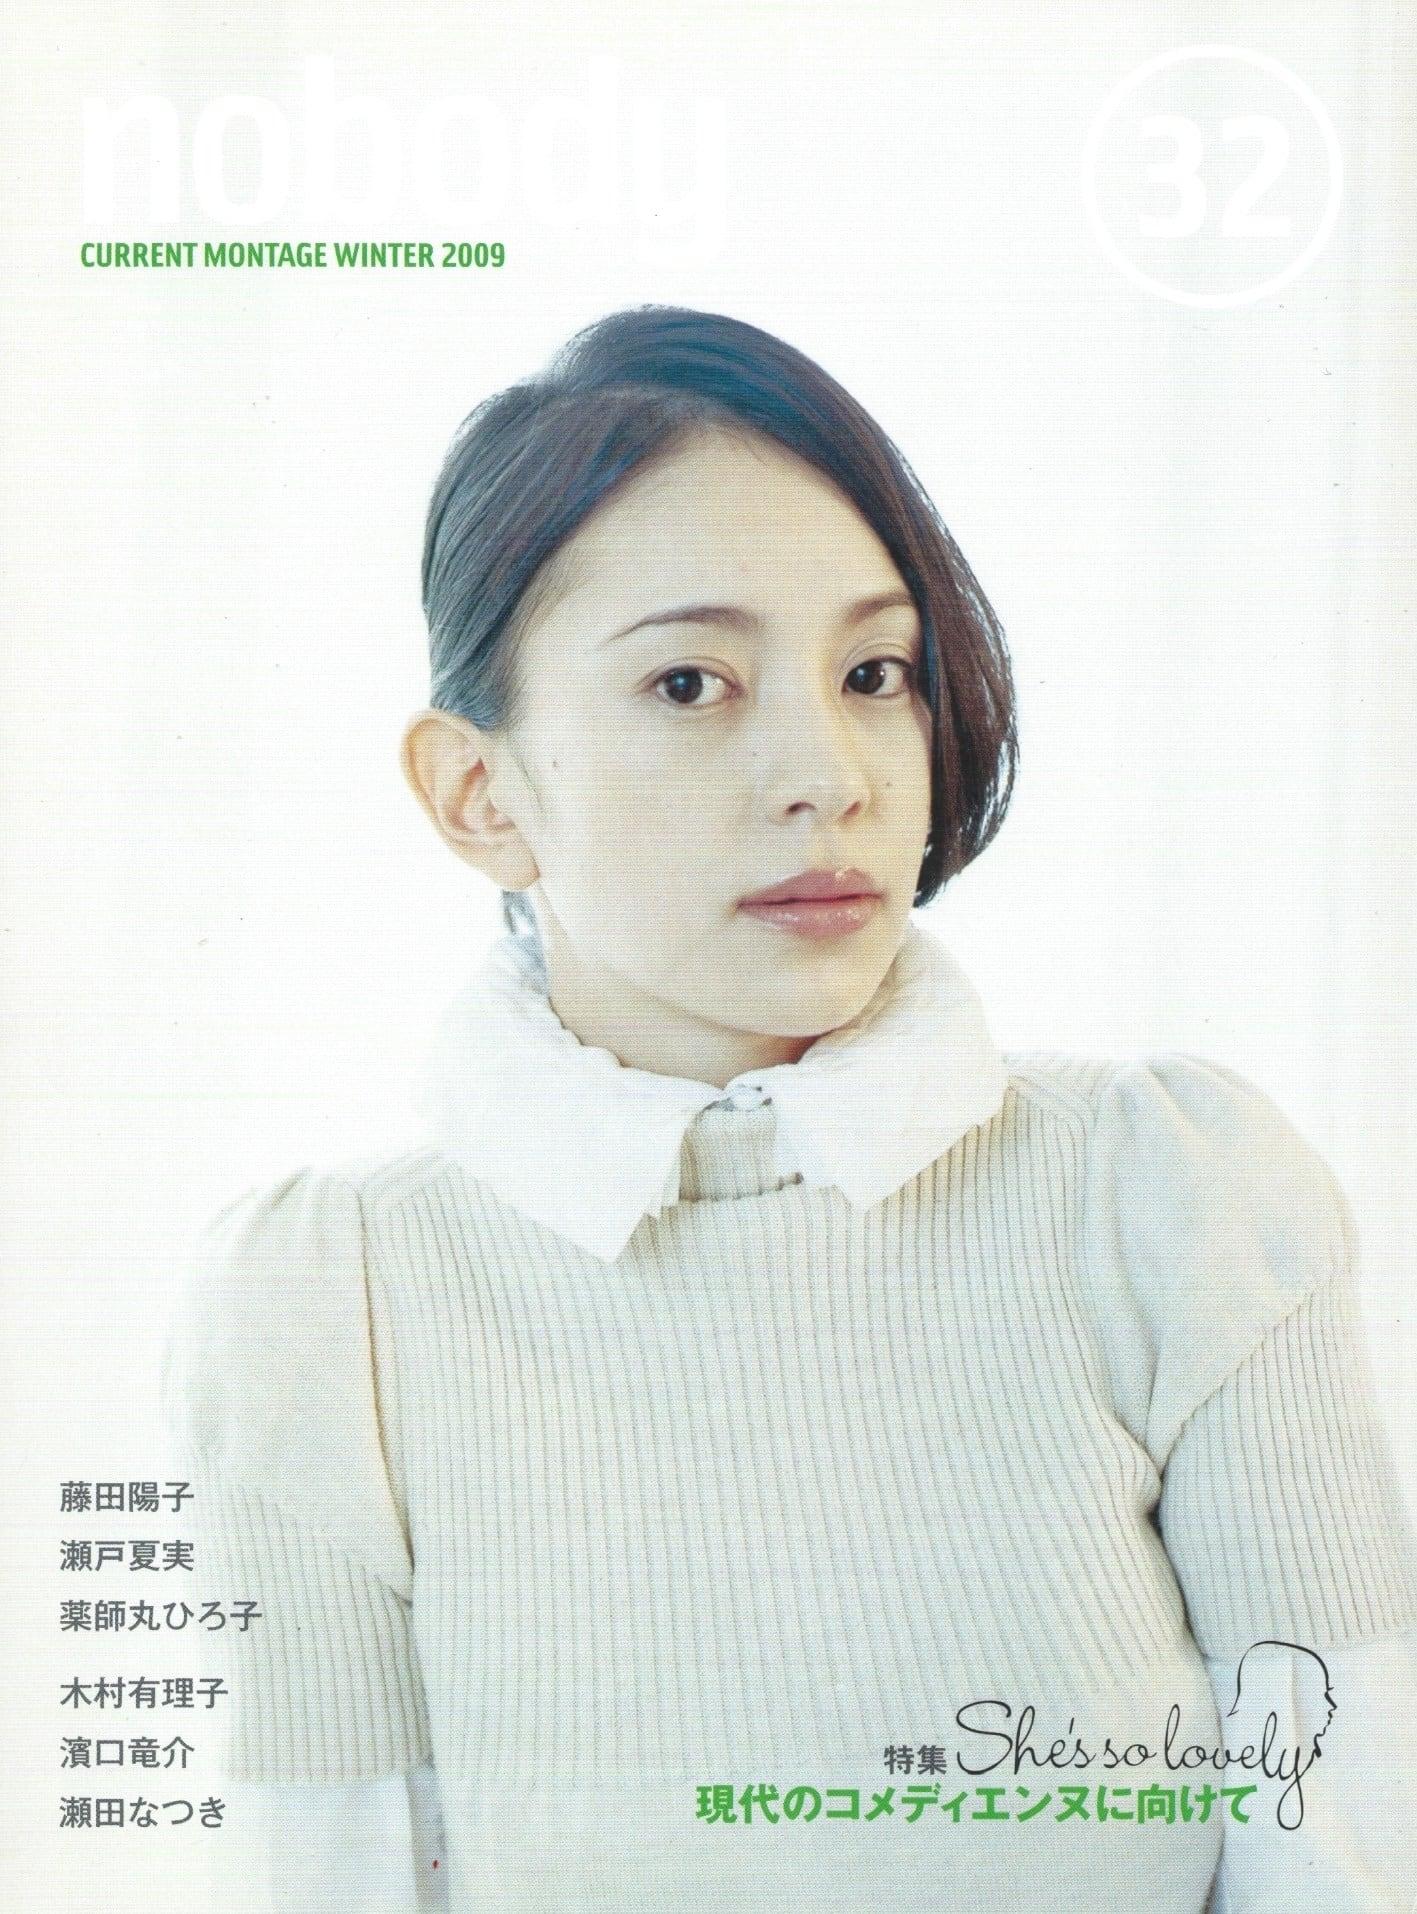 NOBODY issue 32 She's So Lovely——現代のコメディエンヌに向けて